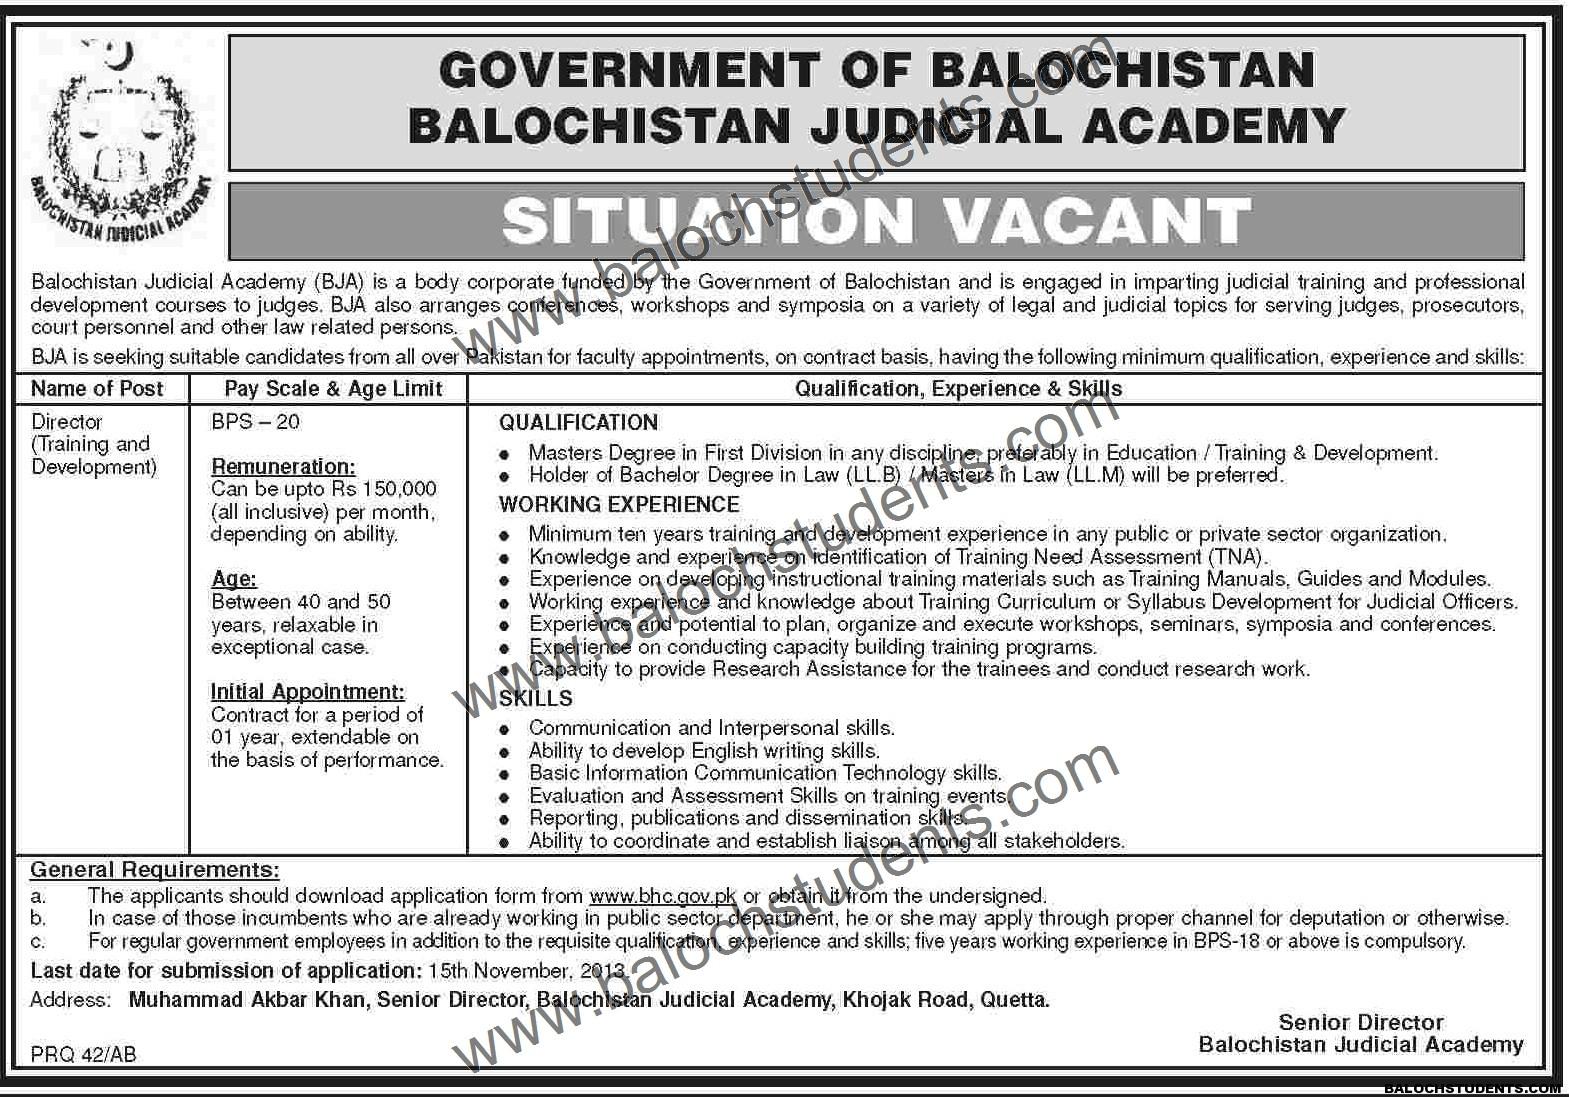 Balochistan Judicial Academy Situation Vacant